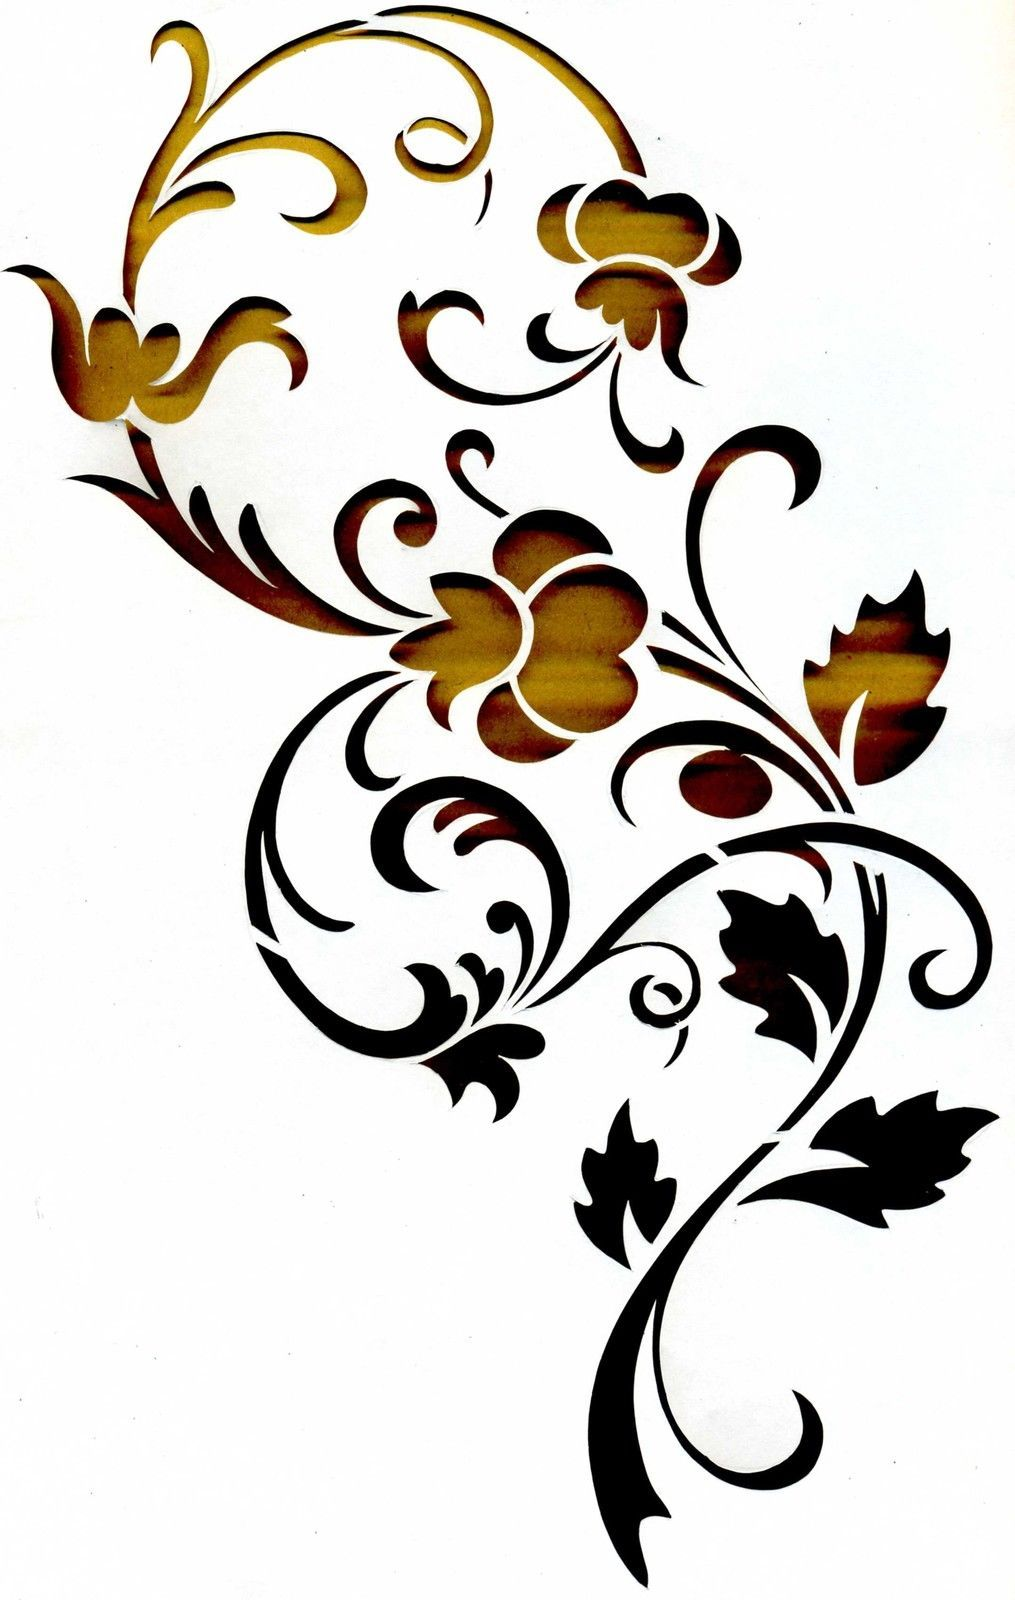 wandschablonen schablone wandtattoo ornament ebay sl. Black Bedroom Furniture Sets. Home Design Ideas